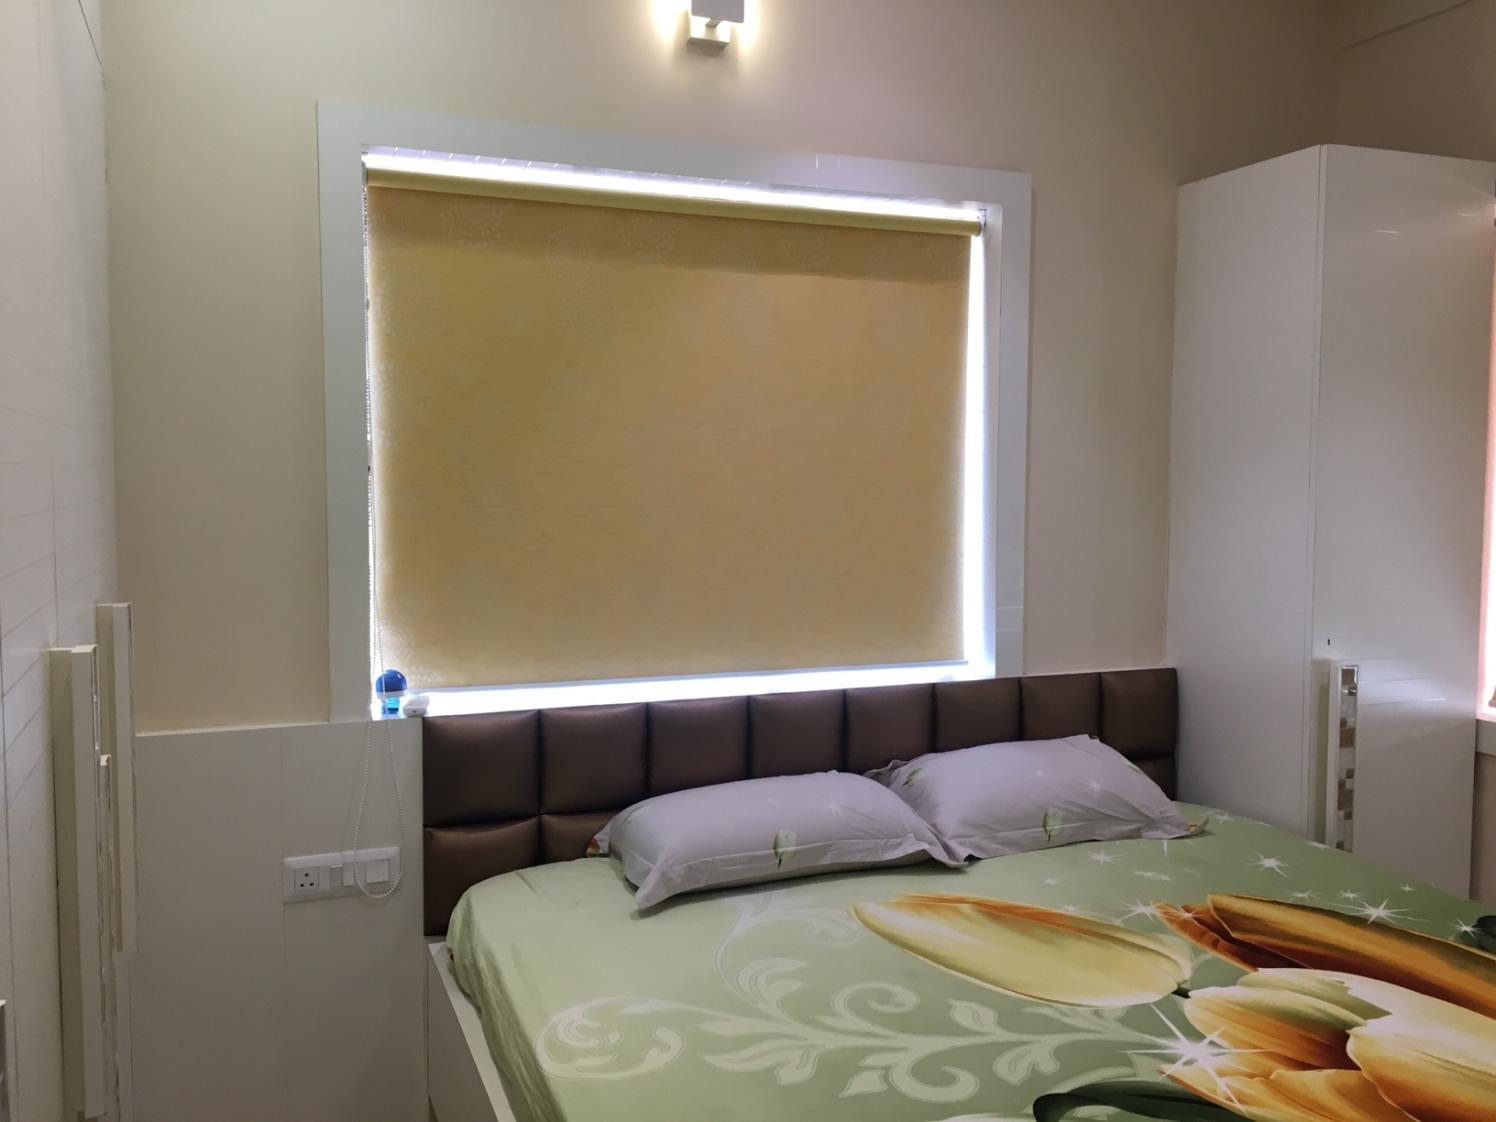 Mix It Up by Rishi Mukherjee Bedroom Modern | Interior Design Photos & Ideas